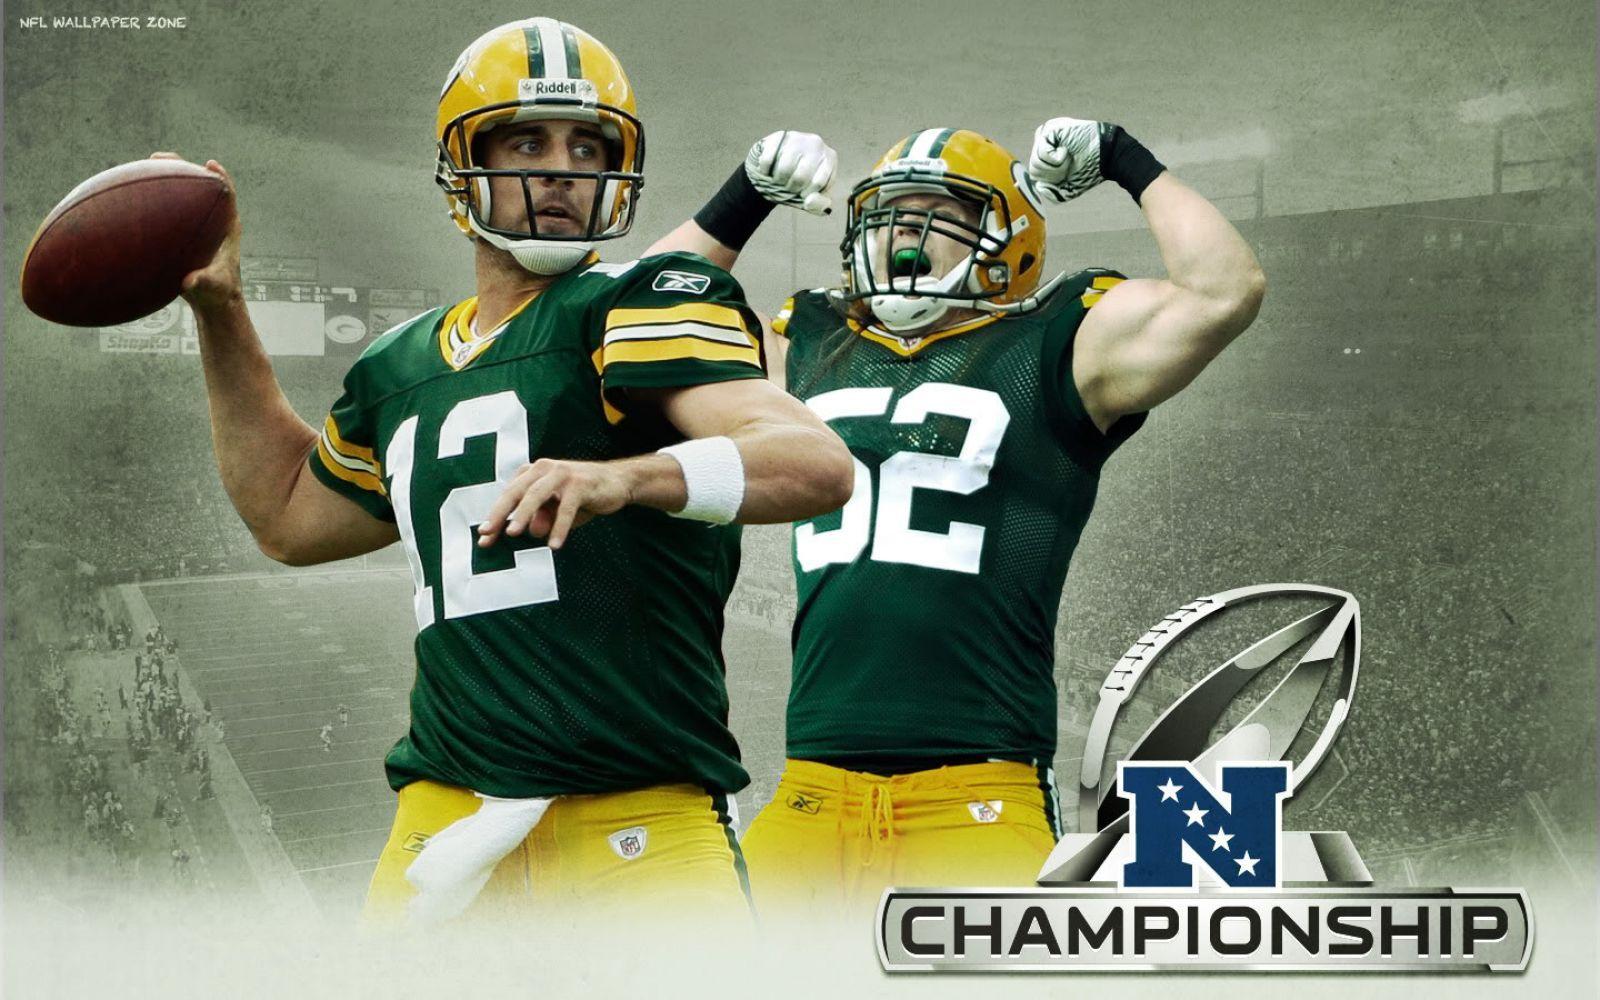 Green Bay Packers Green Bay Packers Wallpaper Green Bay Packers Green Bay